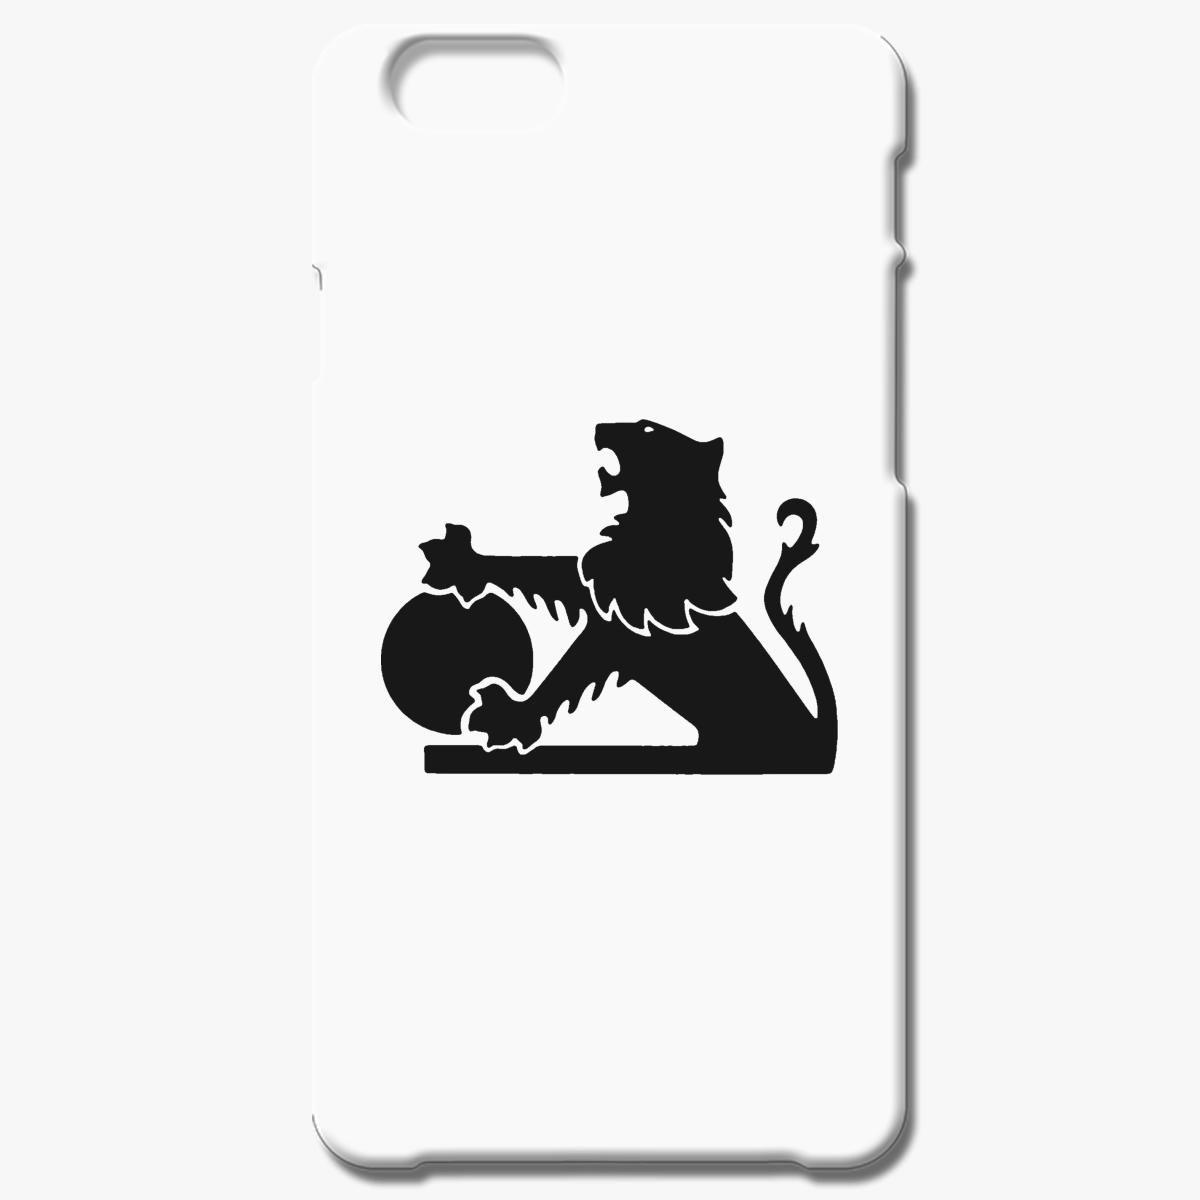 Holden Lion Iphone 6 6s Plus Case